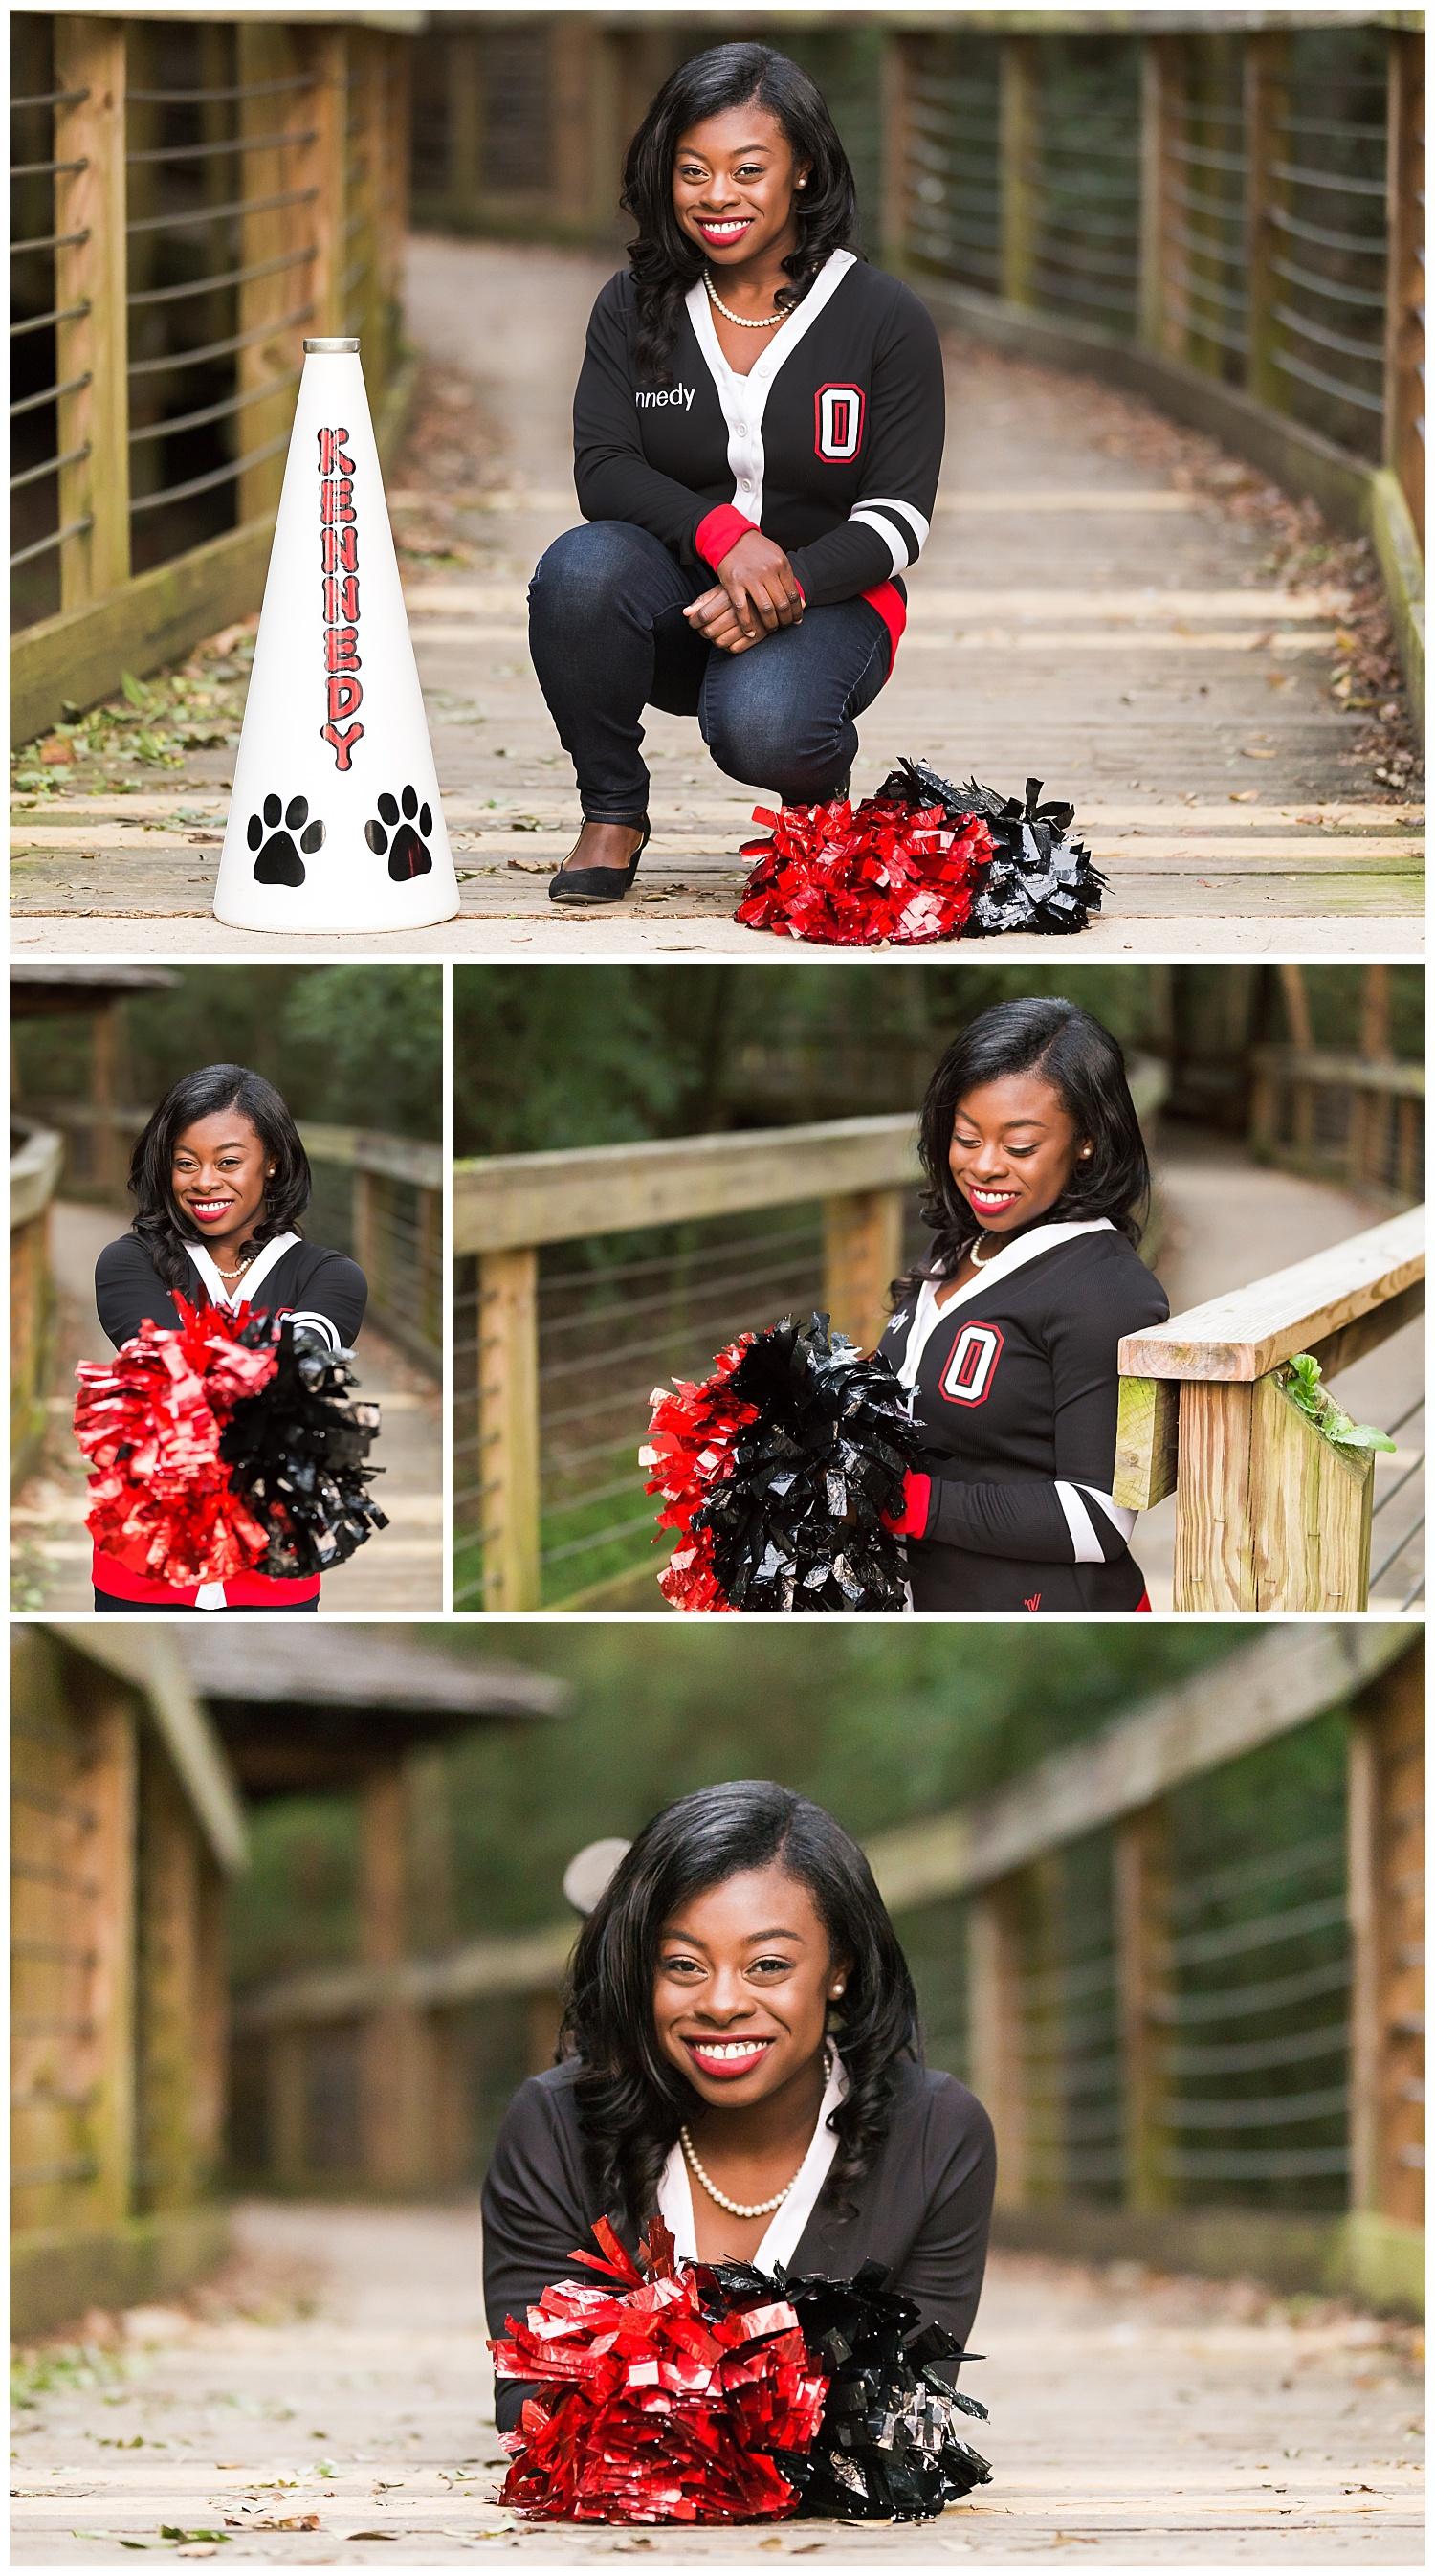 opelika high school cheerleader senior pictures lbeesleyphoto